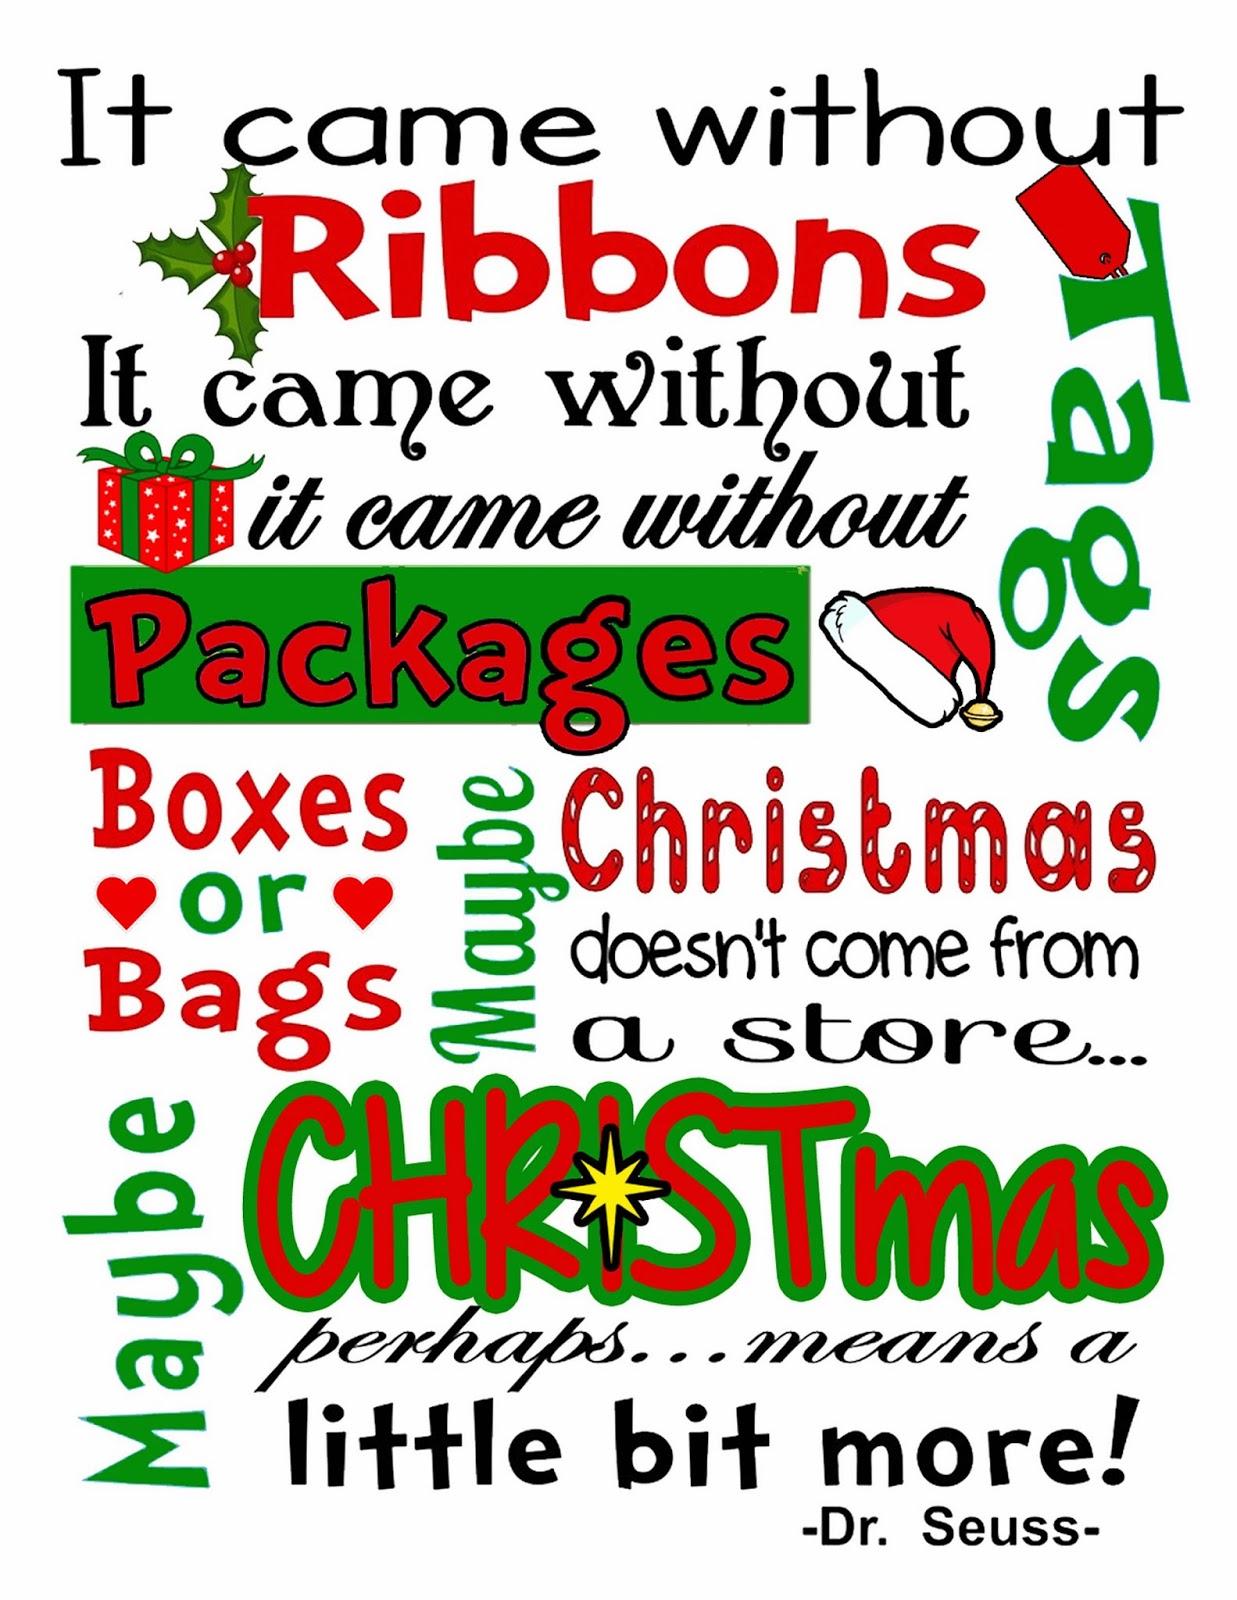 Dr Seuss Christmas Quotes. QuotesGram